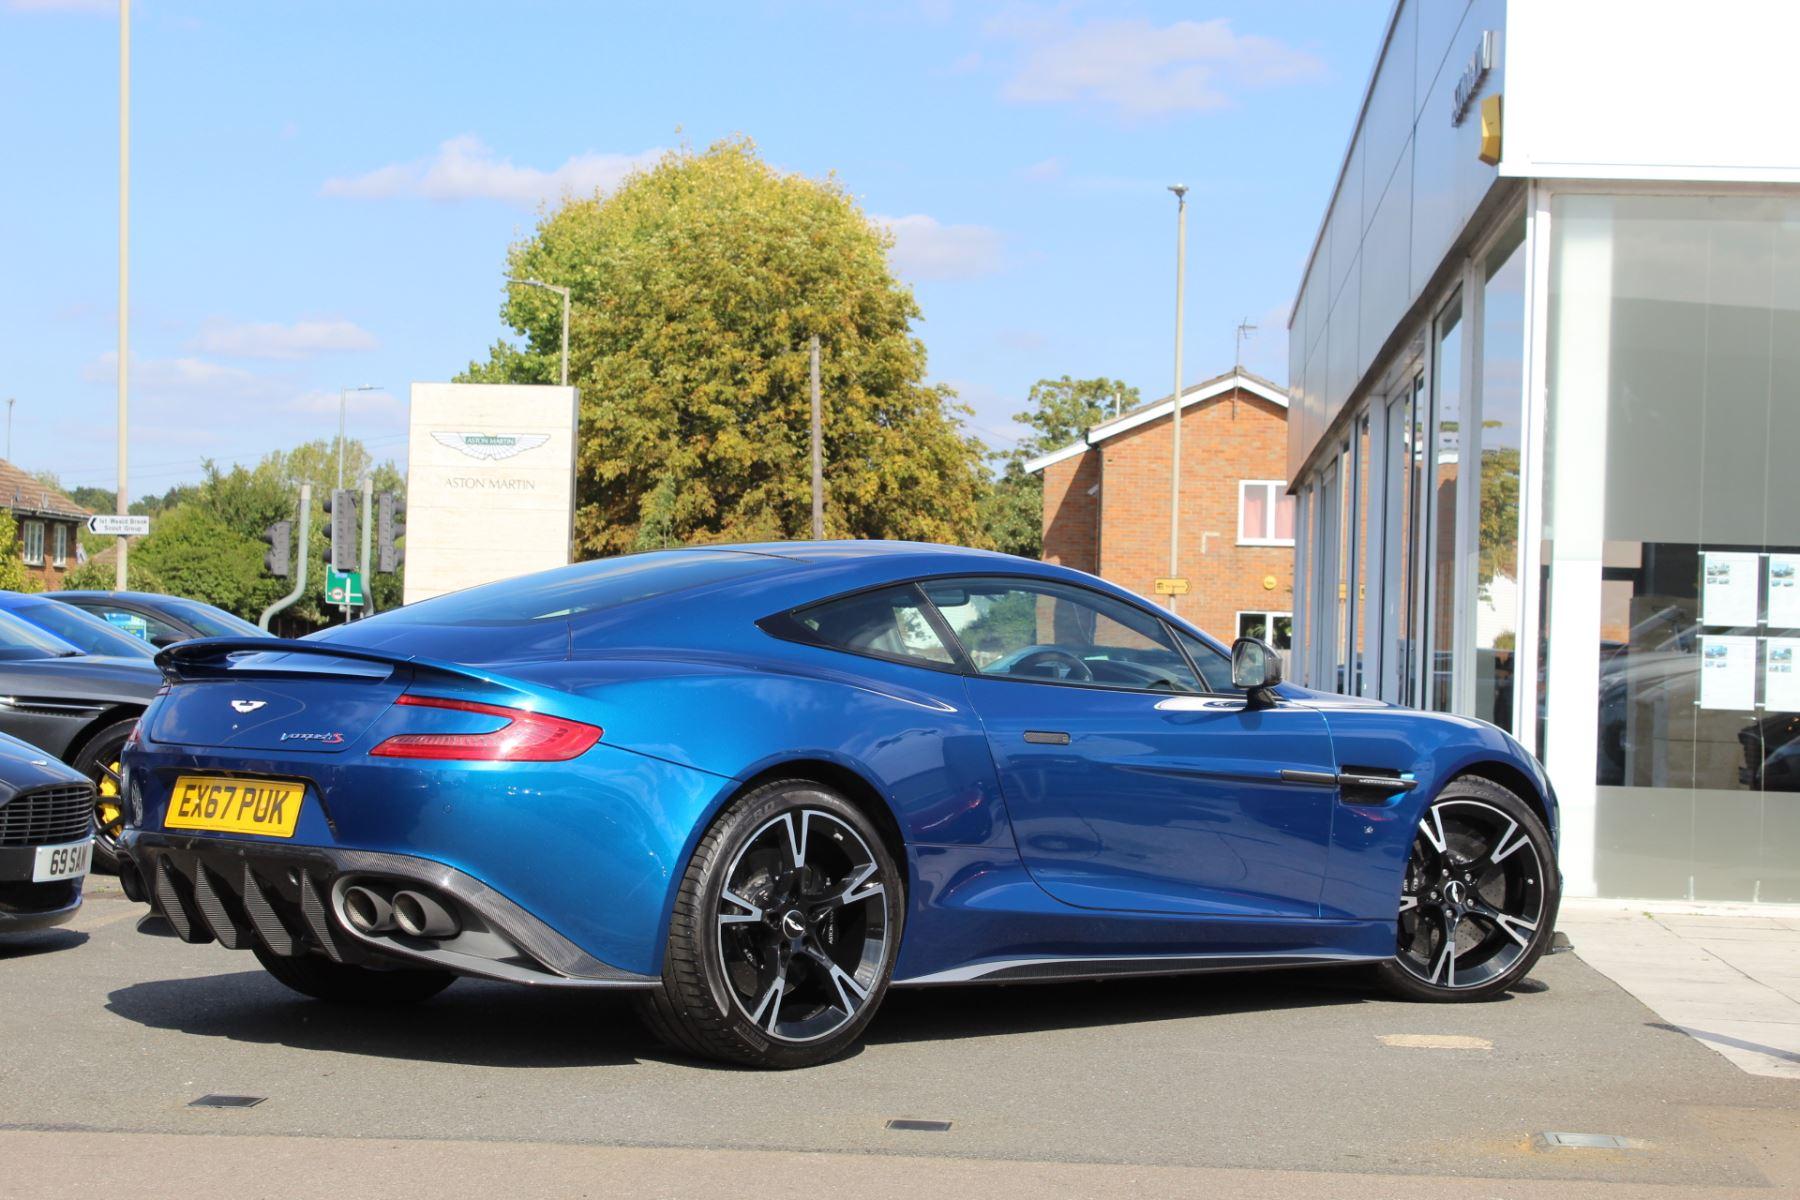 Aston Martin Vanquish V12 [595] S 2+2 2dr Touchtronic image 9